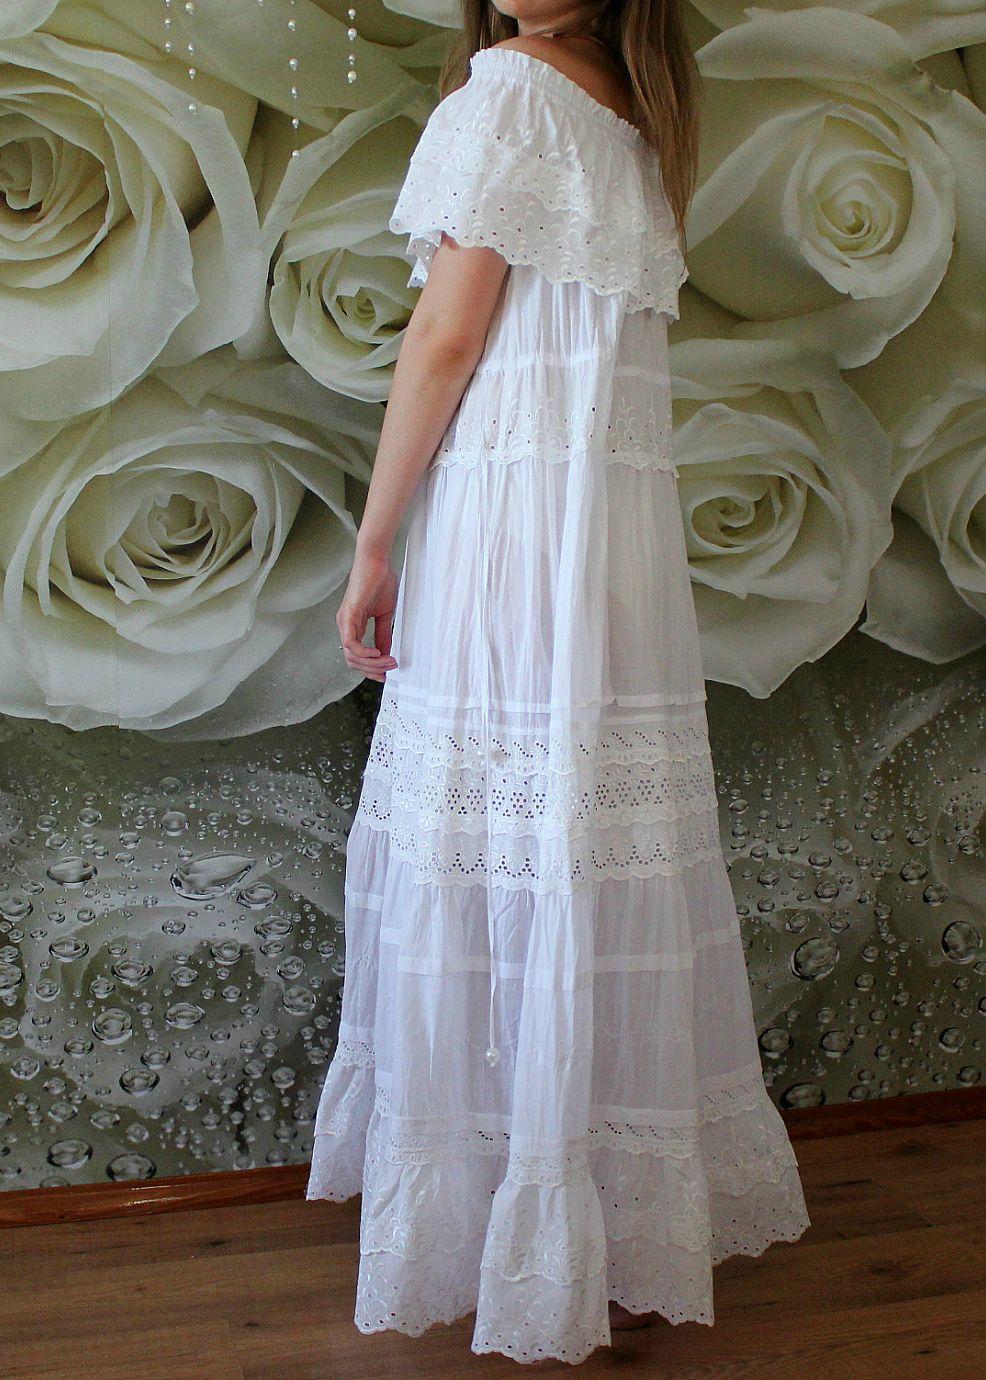 Off Shoulder Boho Wedding Dress Maxi White Linen Lace Gown Eco Wedding Dress Plus Size Bohemian Beach Wedding Dress Maternity Dress Handmade Long White Dress Boho Bohemian Beach Wedding Dress Eco [ 1380 x 986 Pixel ]